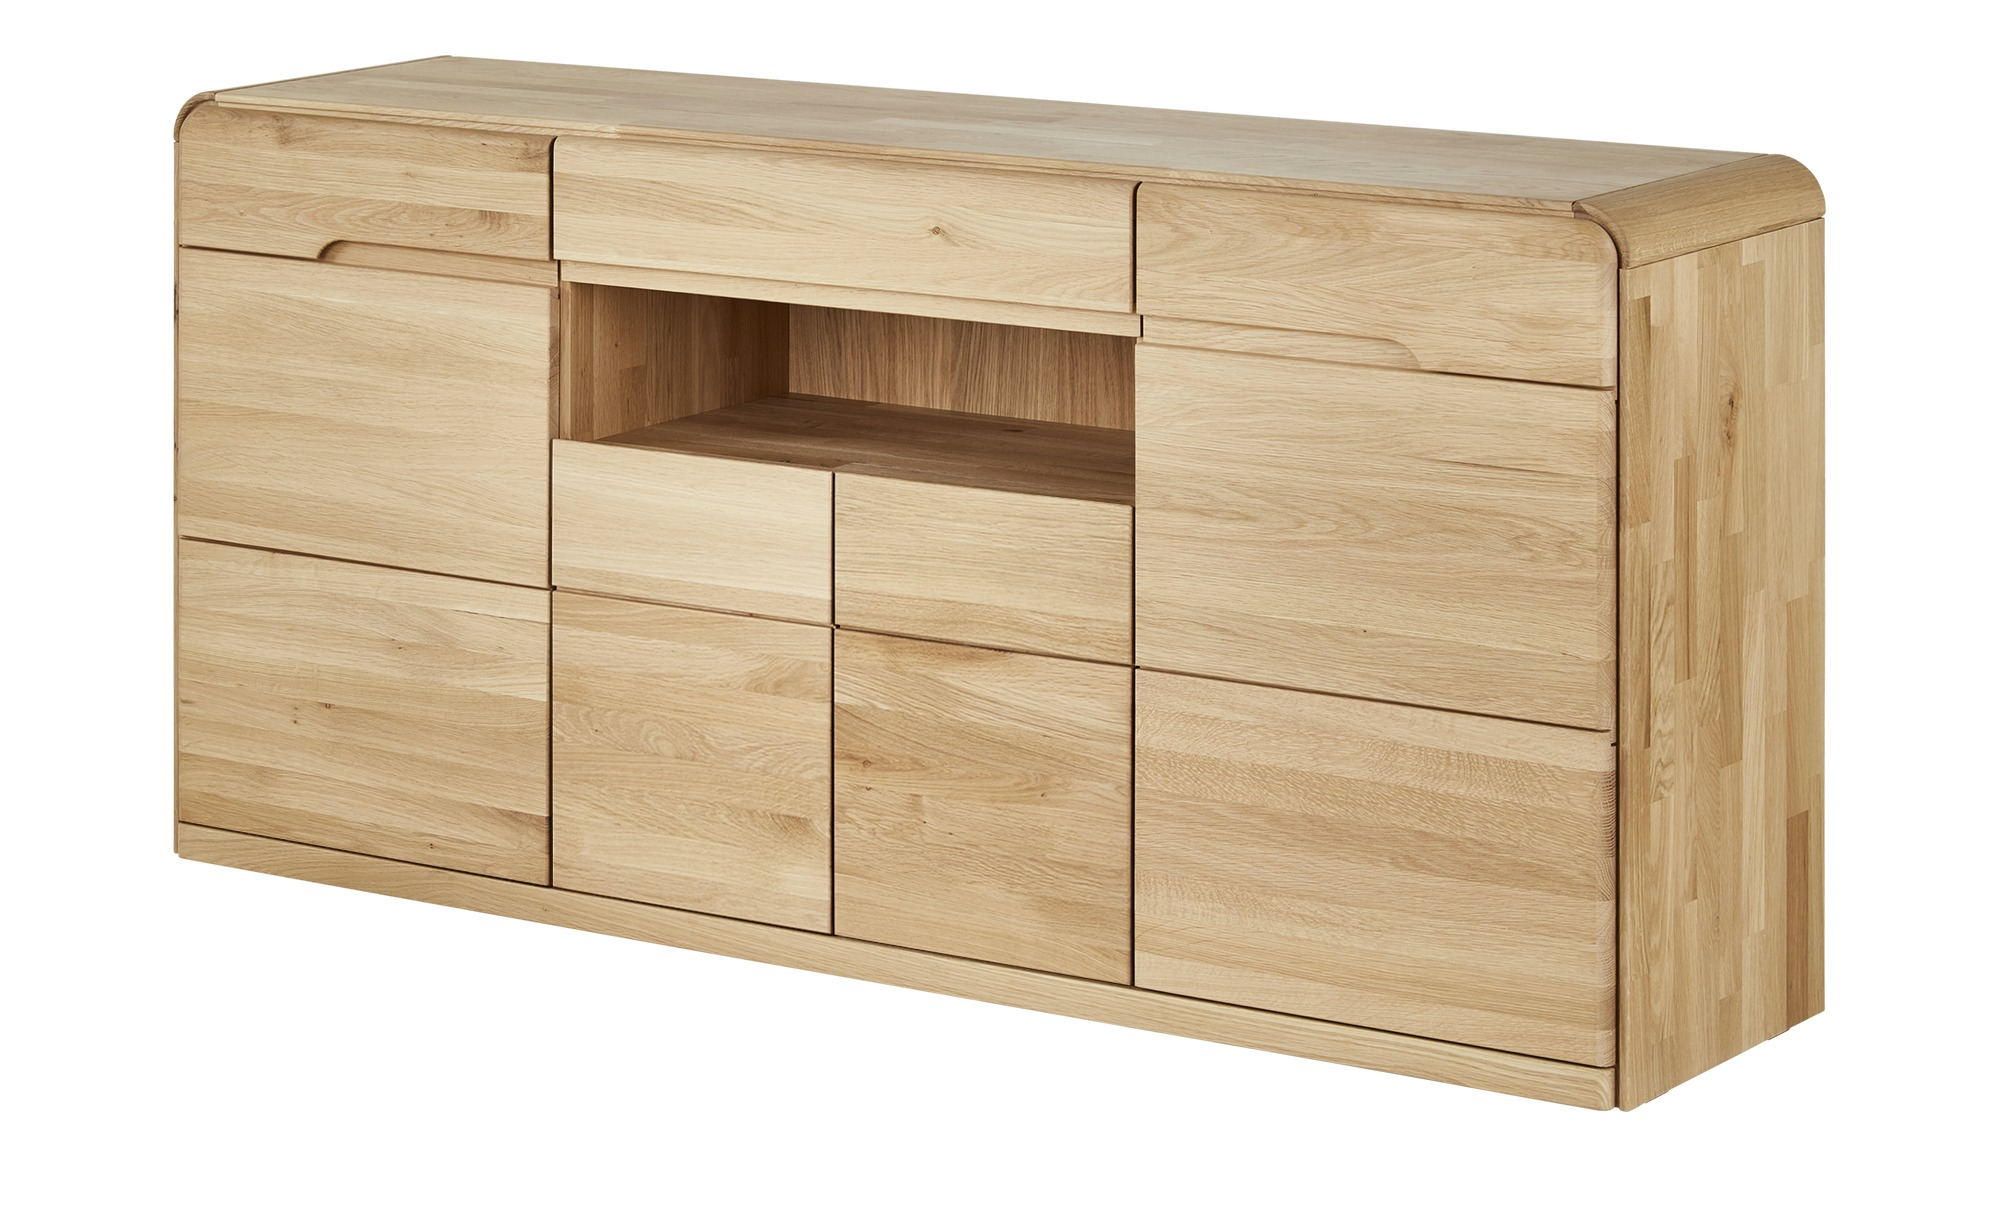 Woodford Sideboard   Merano ¦ Maße (cm): B: 176 H: 86 T: 43 Kommoden & Sideboards > Sideboards - Höffner